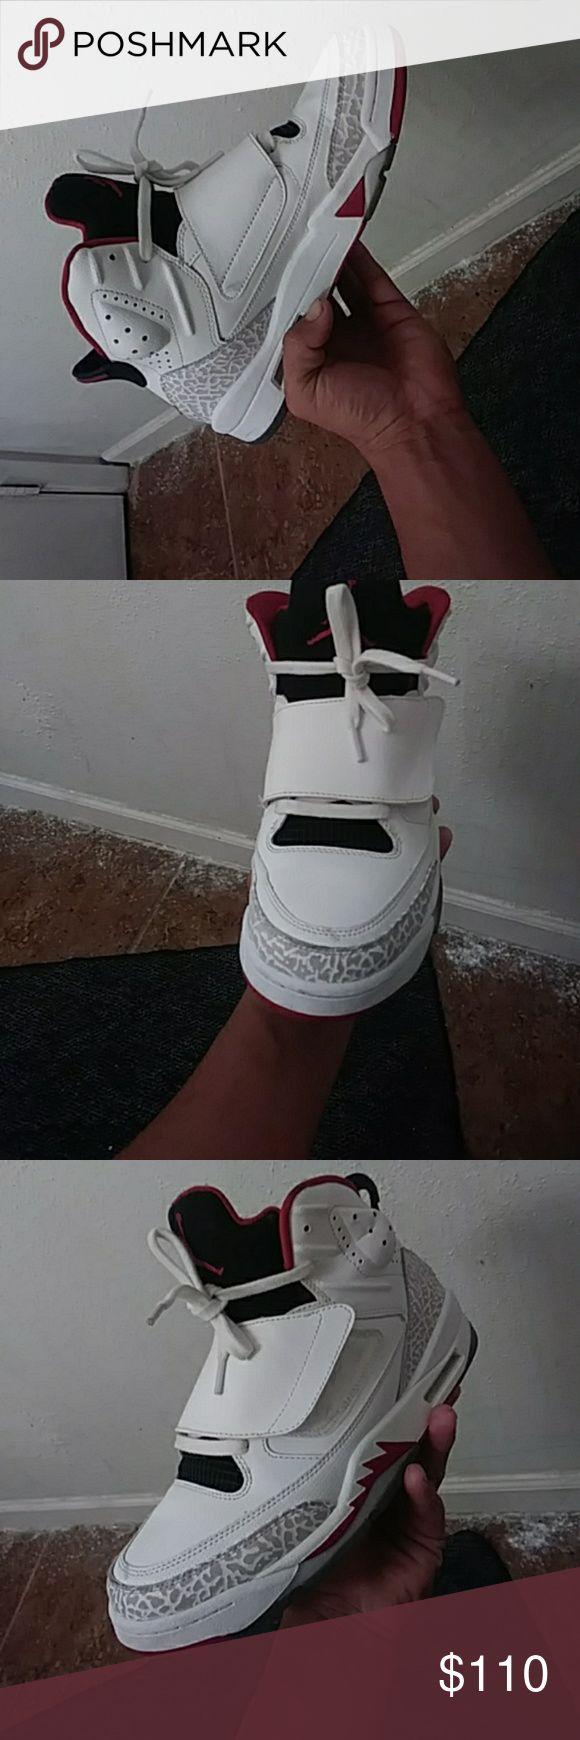 Shoes jordan Dos meses usados Jordan Shoes Boots